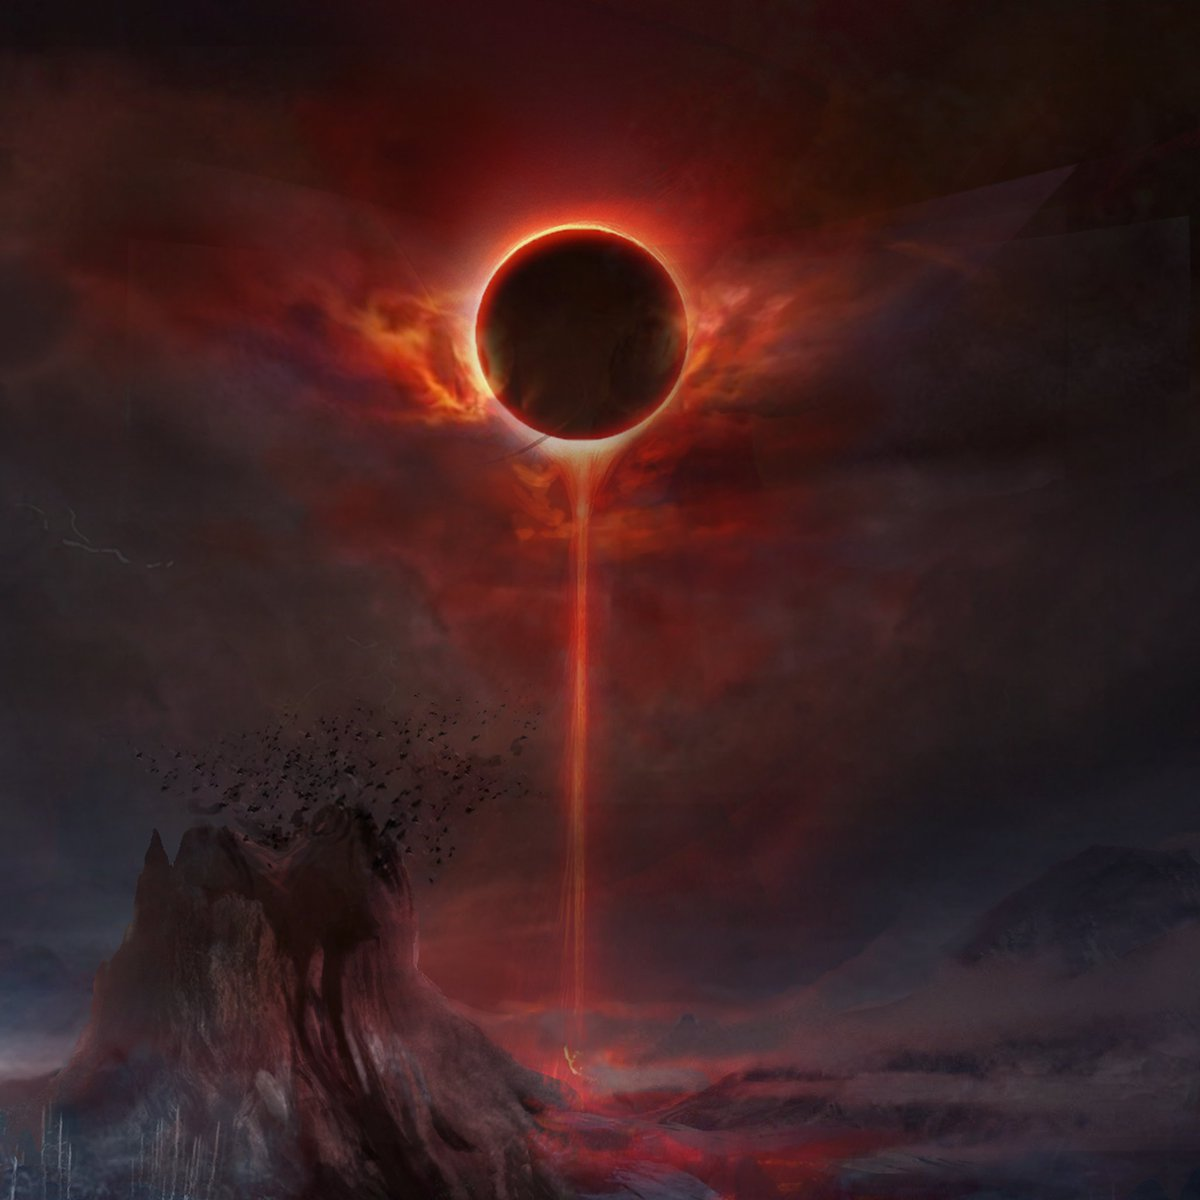 Ebiflynageruyo On Twitter Darksouls3 Praise The Dark Sun